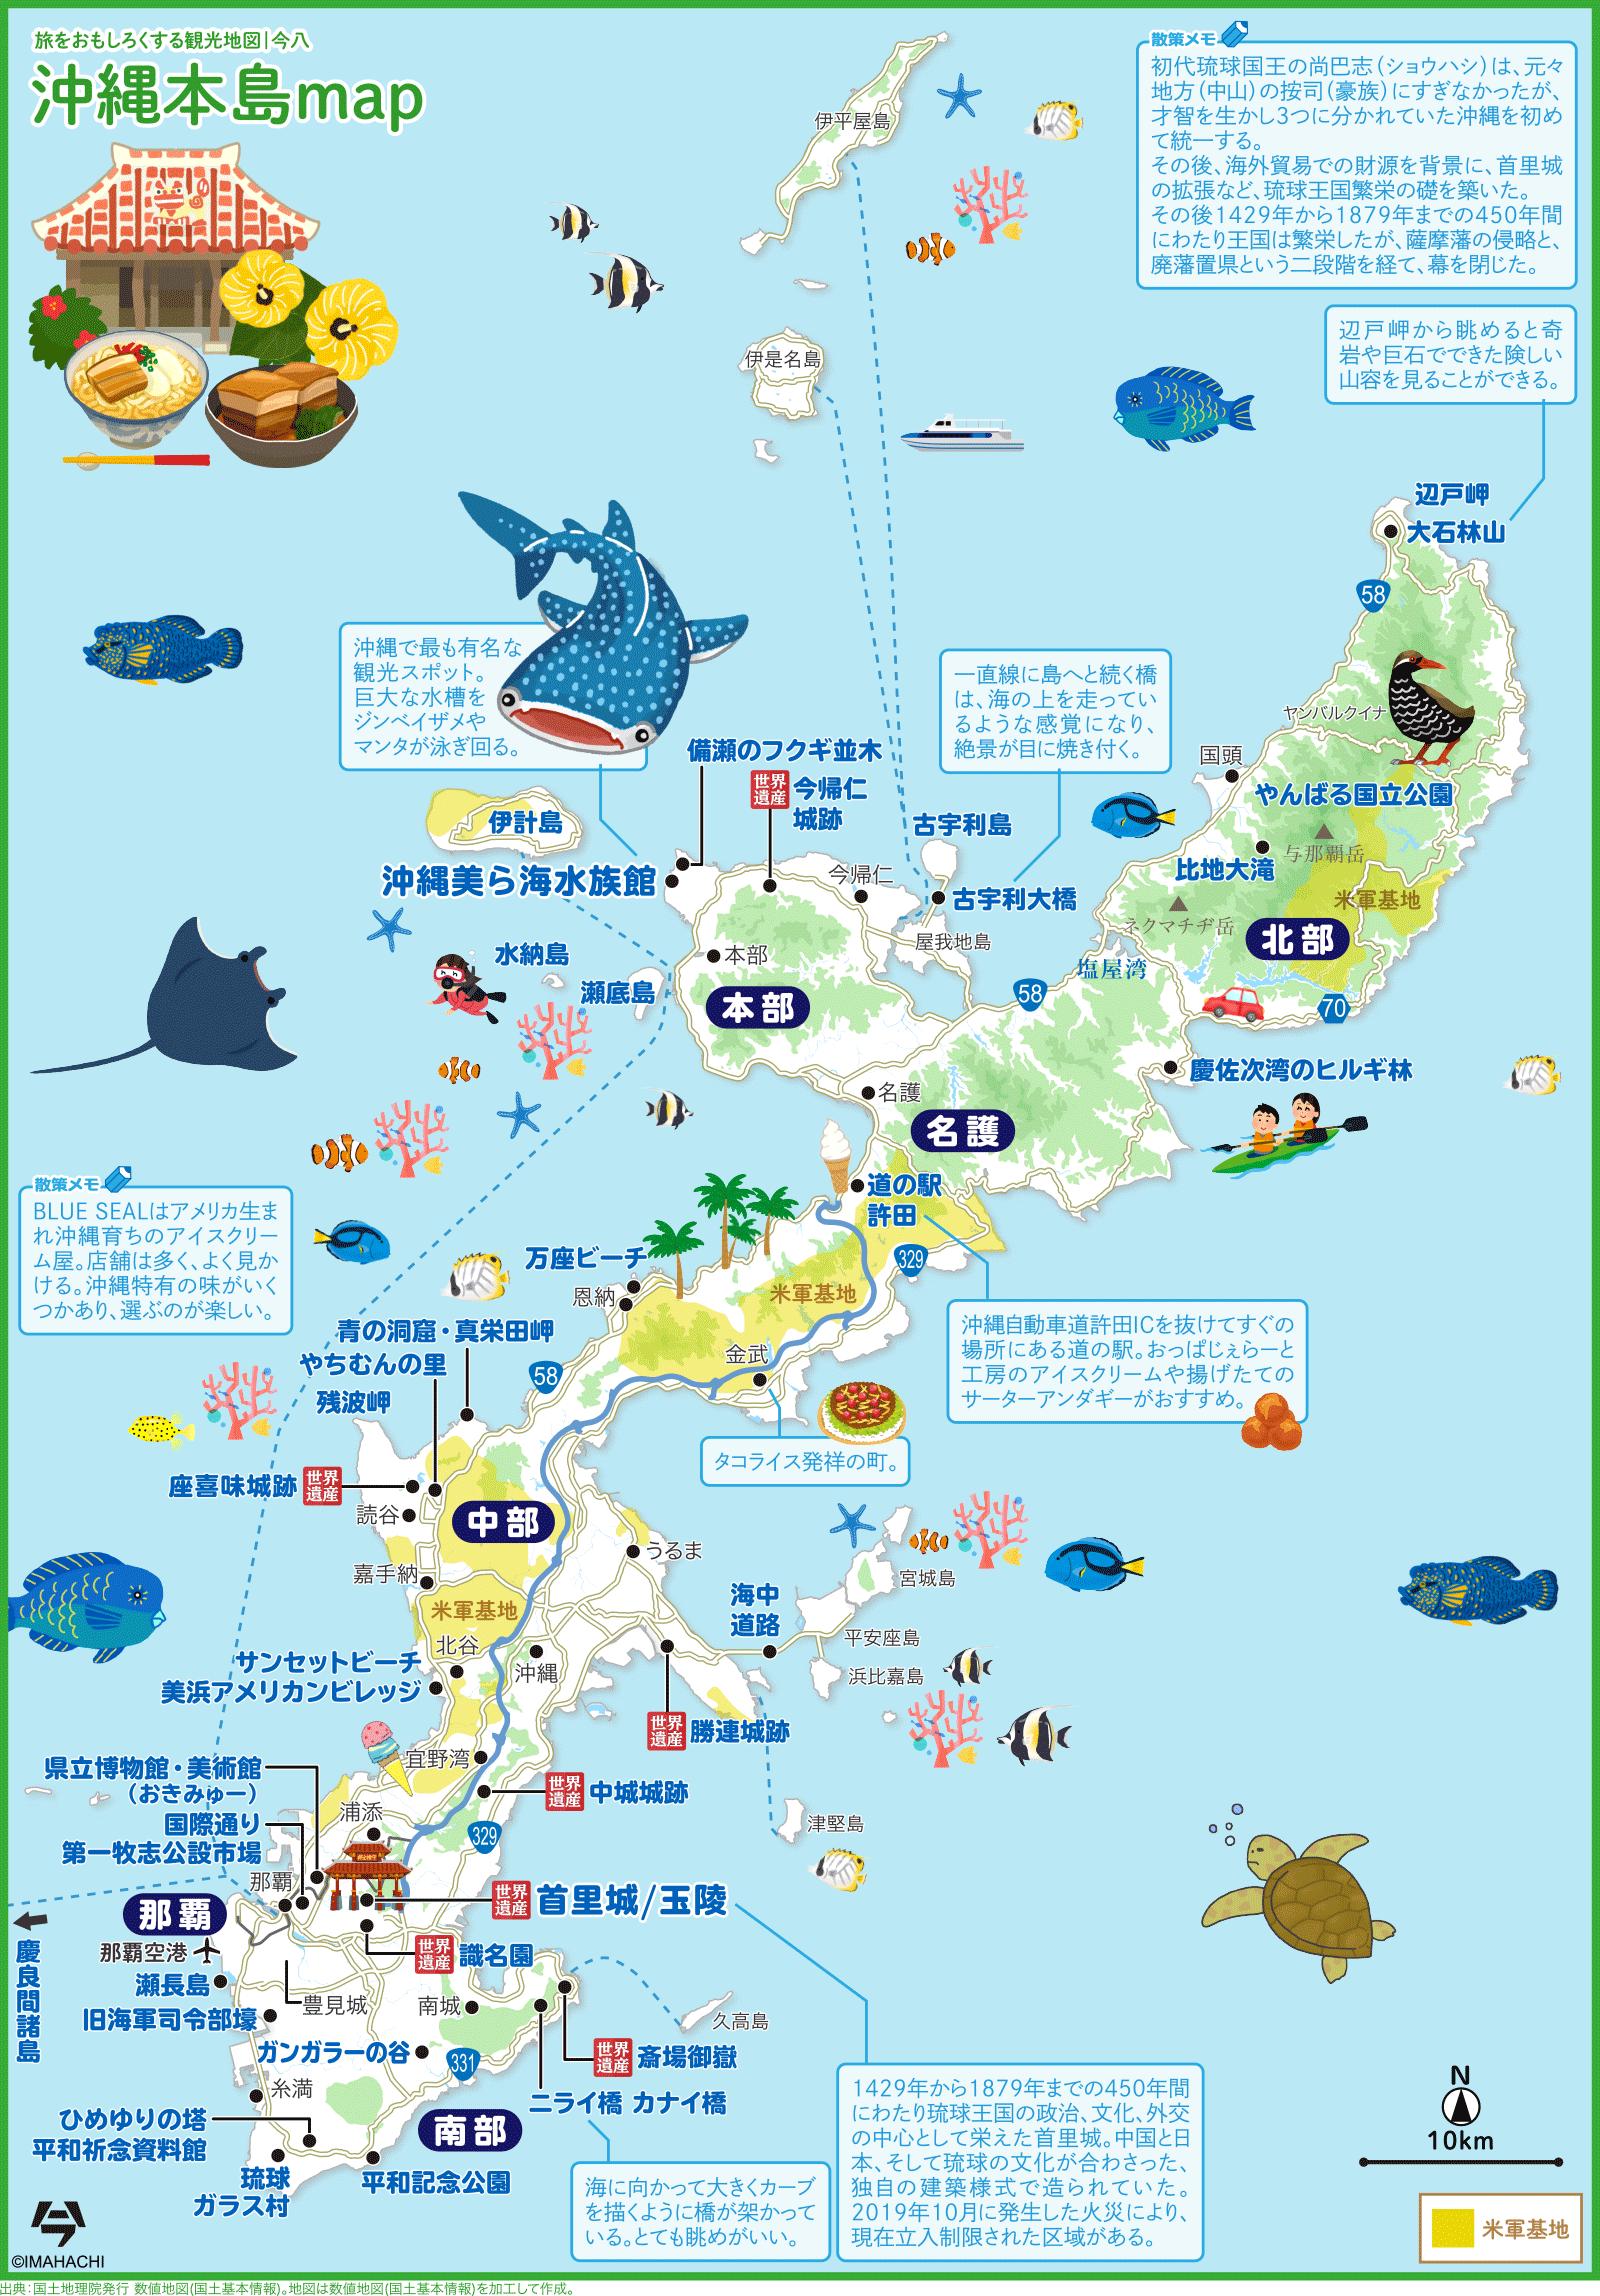 沖縄本島map